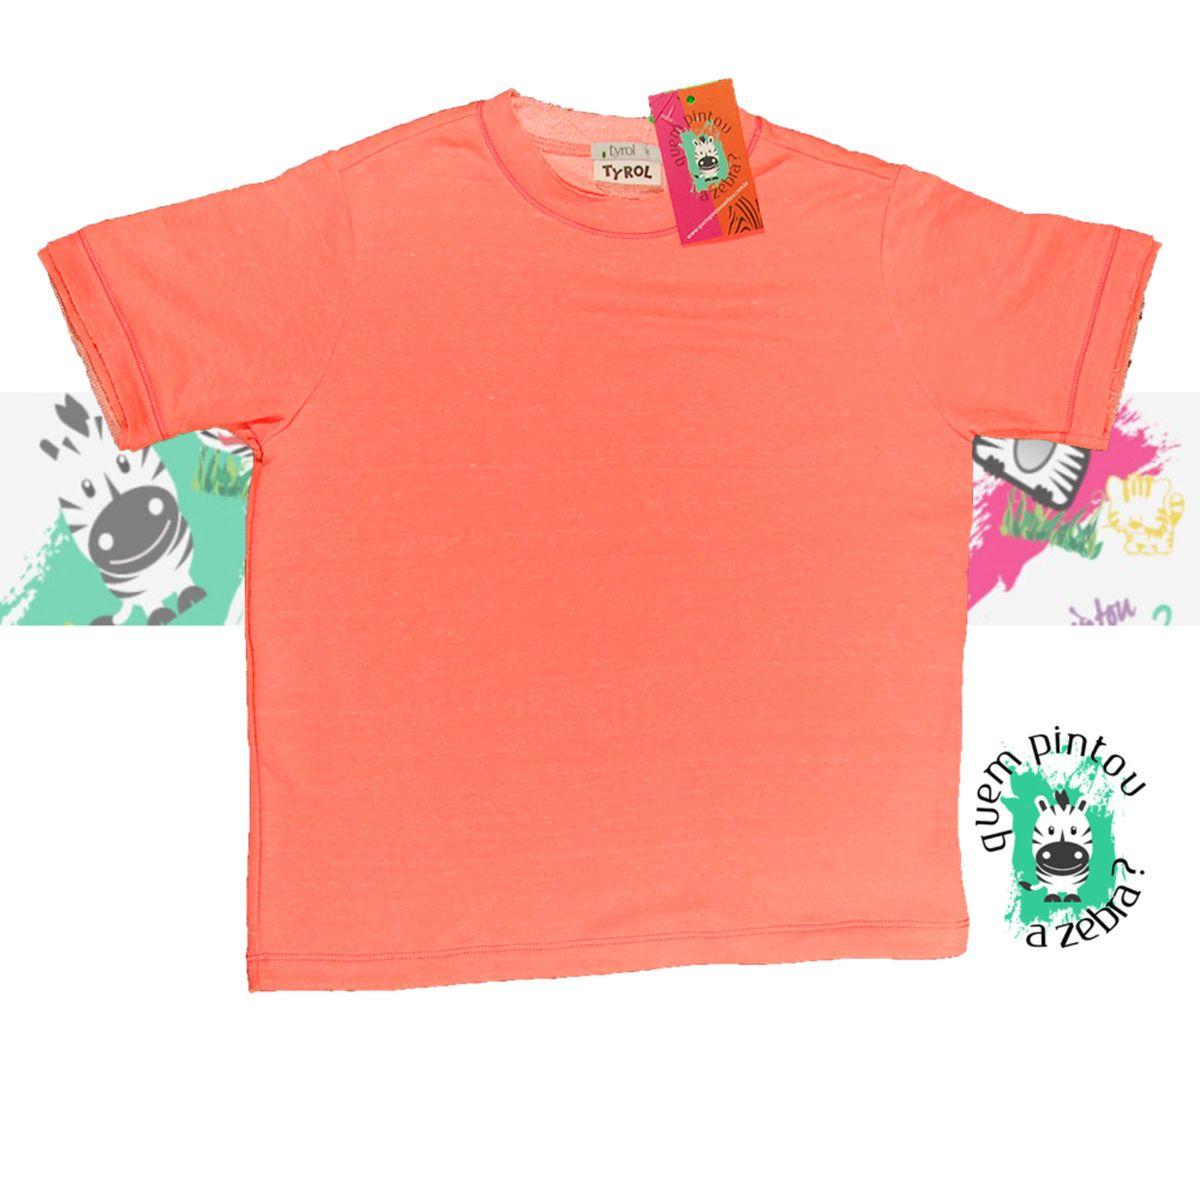 81196cdf4f Camisa Cheguei Tyrol